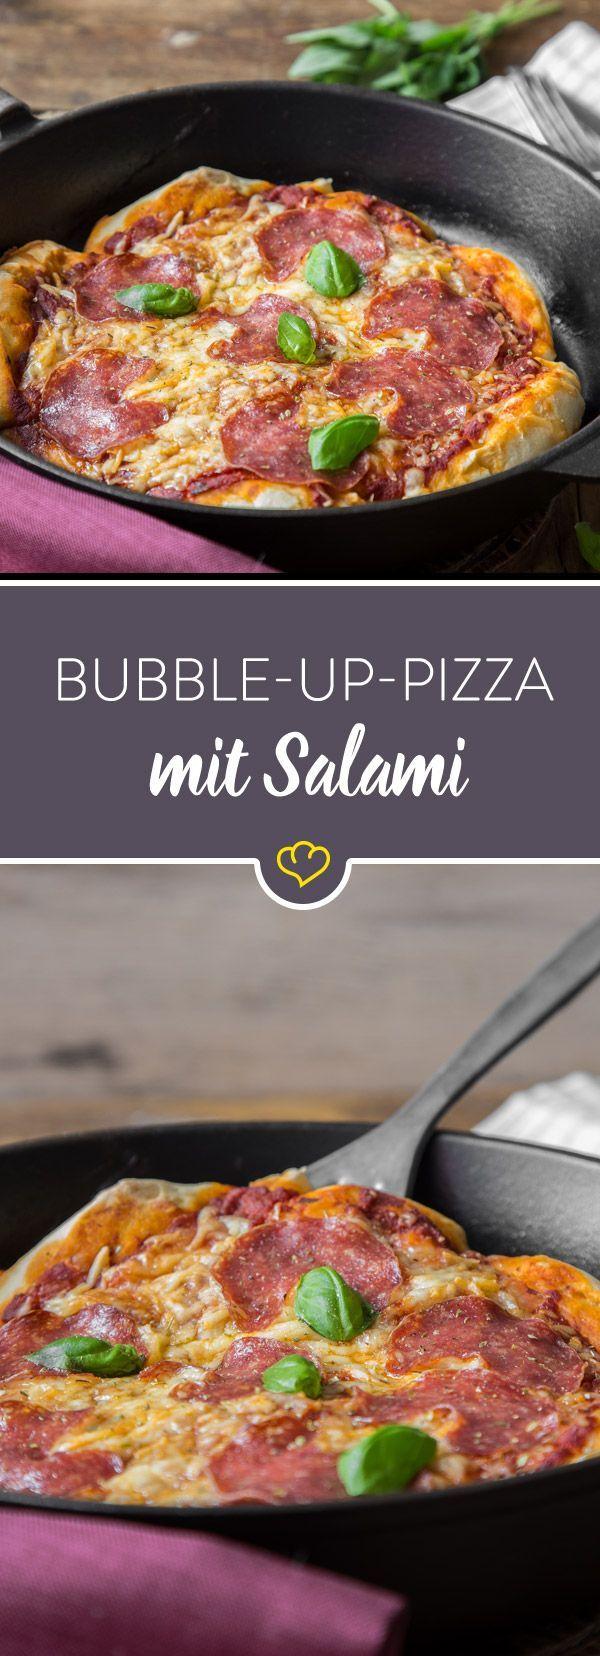 super fluffig bubble up pizza mit salami rezept essen pinterest rezepte kochrezepte. Black Bedroom Furniture Sets. Home Design Ideas